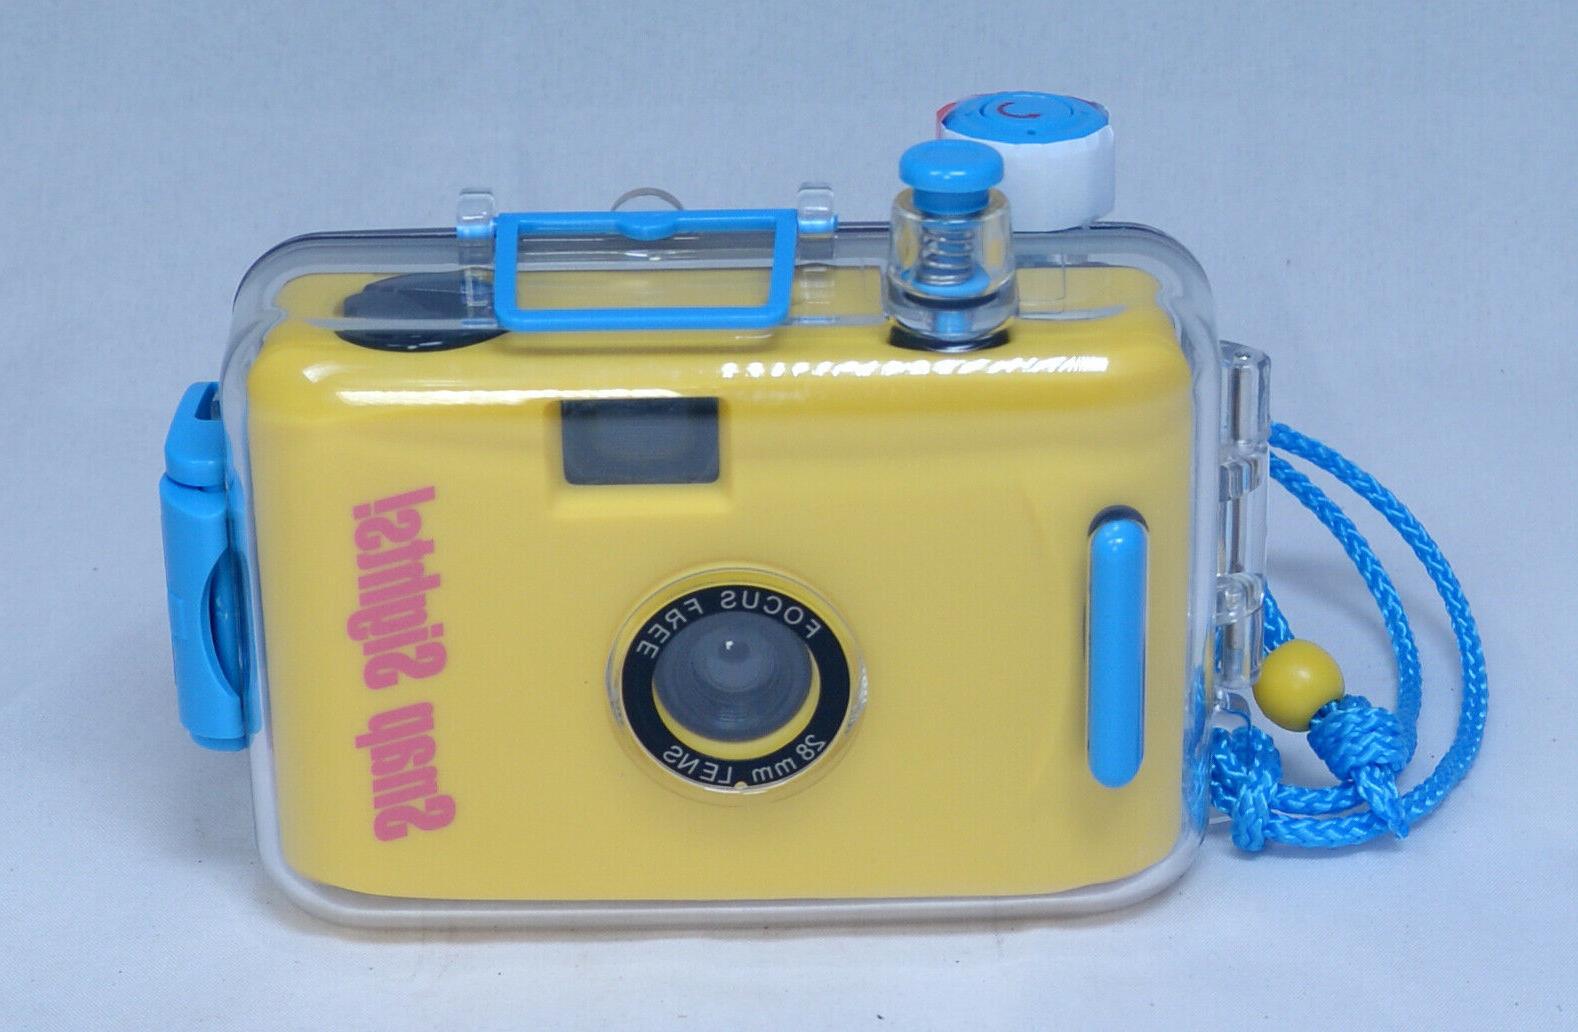 snap sights compact 35mm film camera waterproof